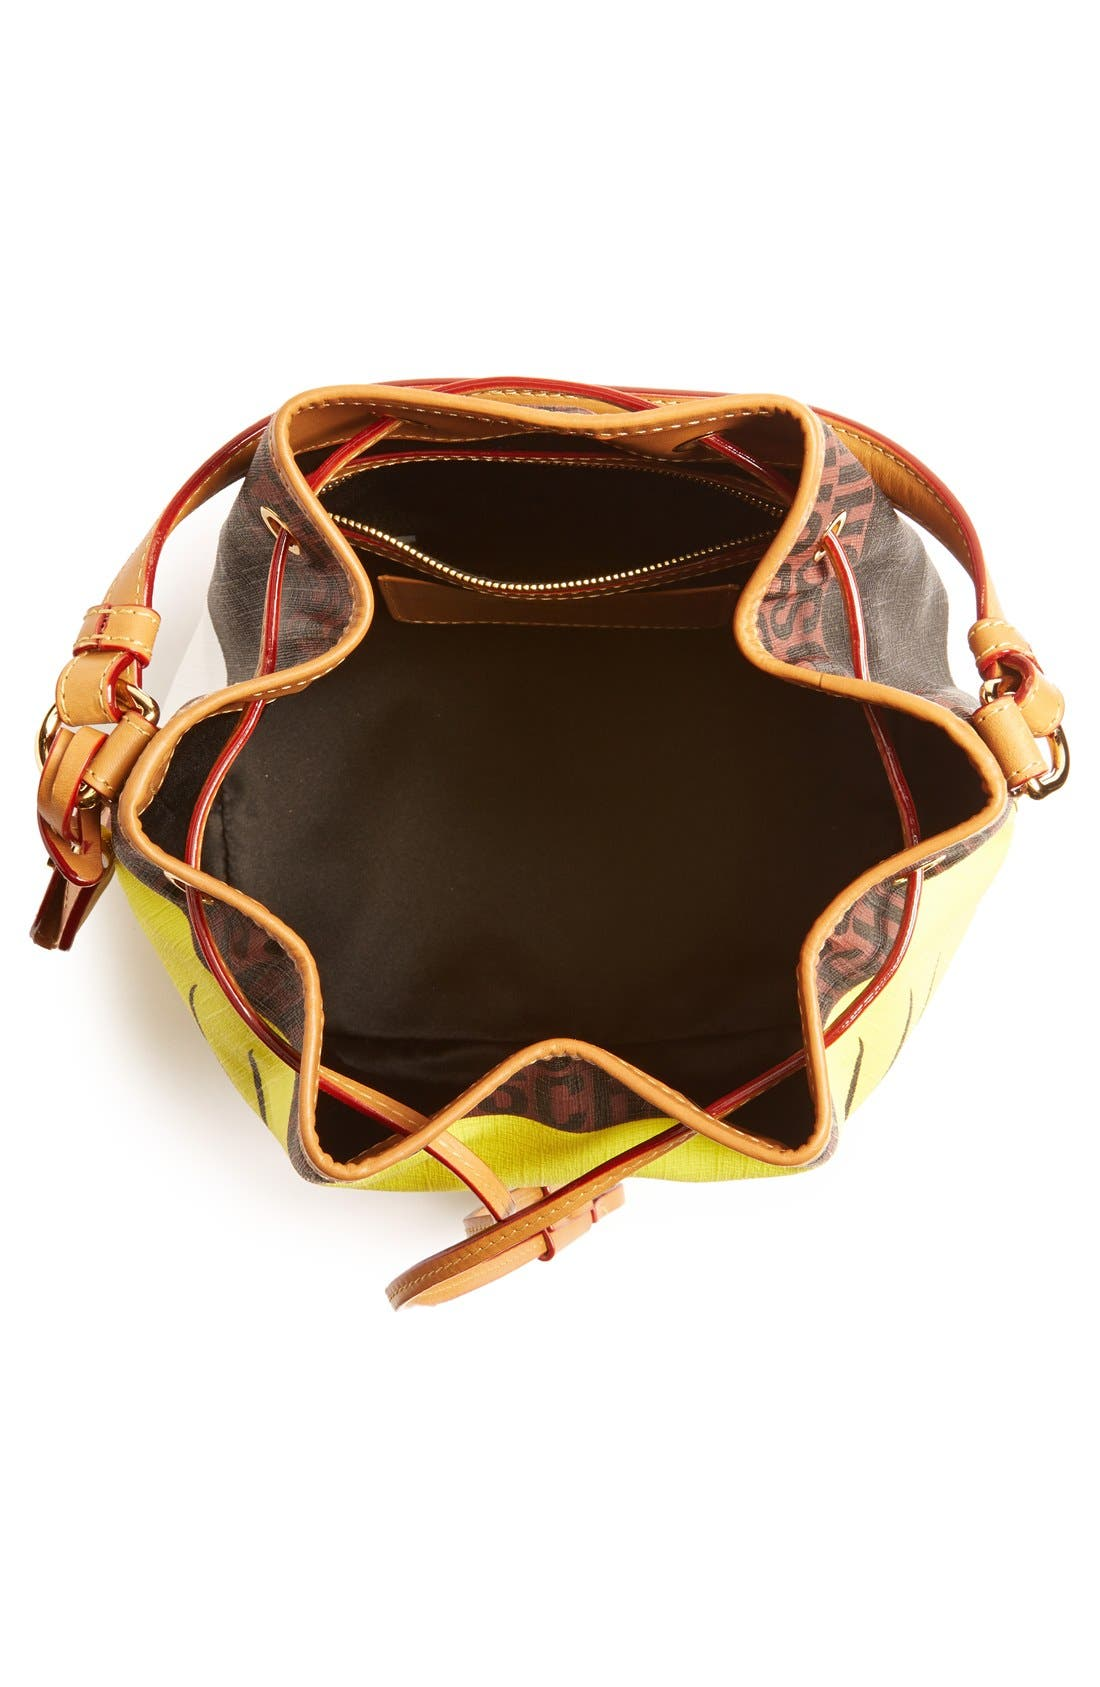 'LooneyTunes - Tweety& Sylvester' Bucket Bag,                             Alternate thumbnail 5, color,                             200